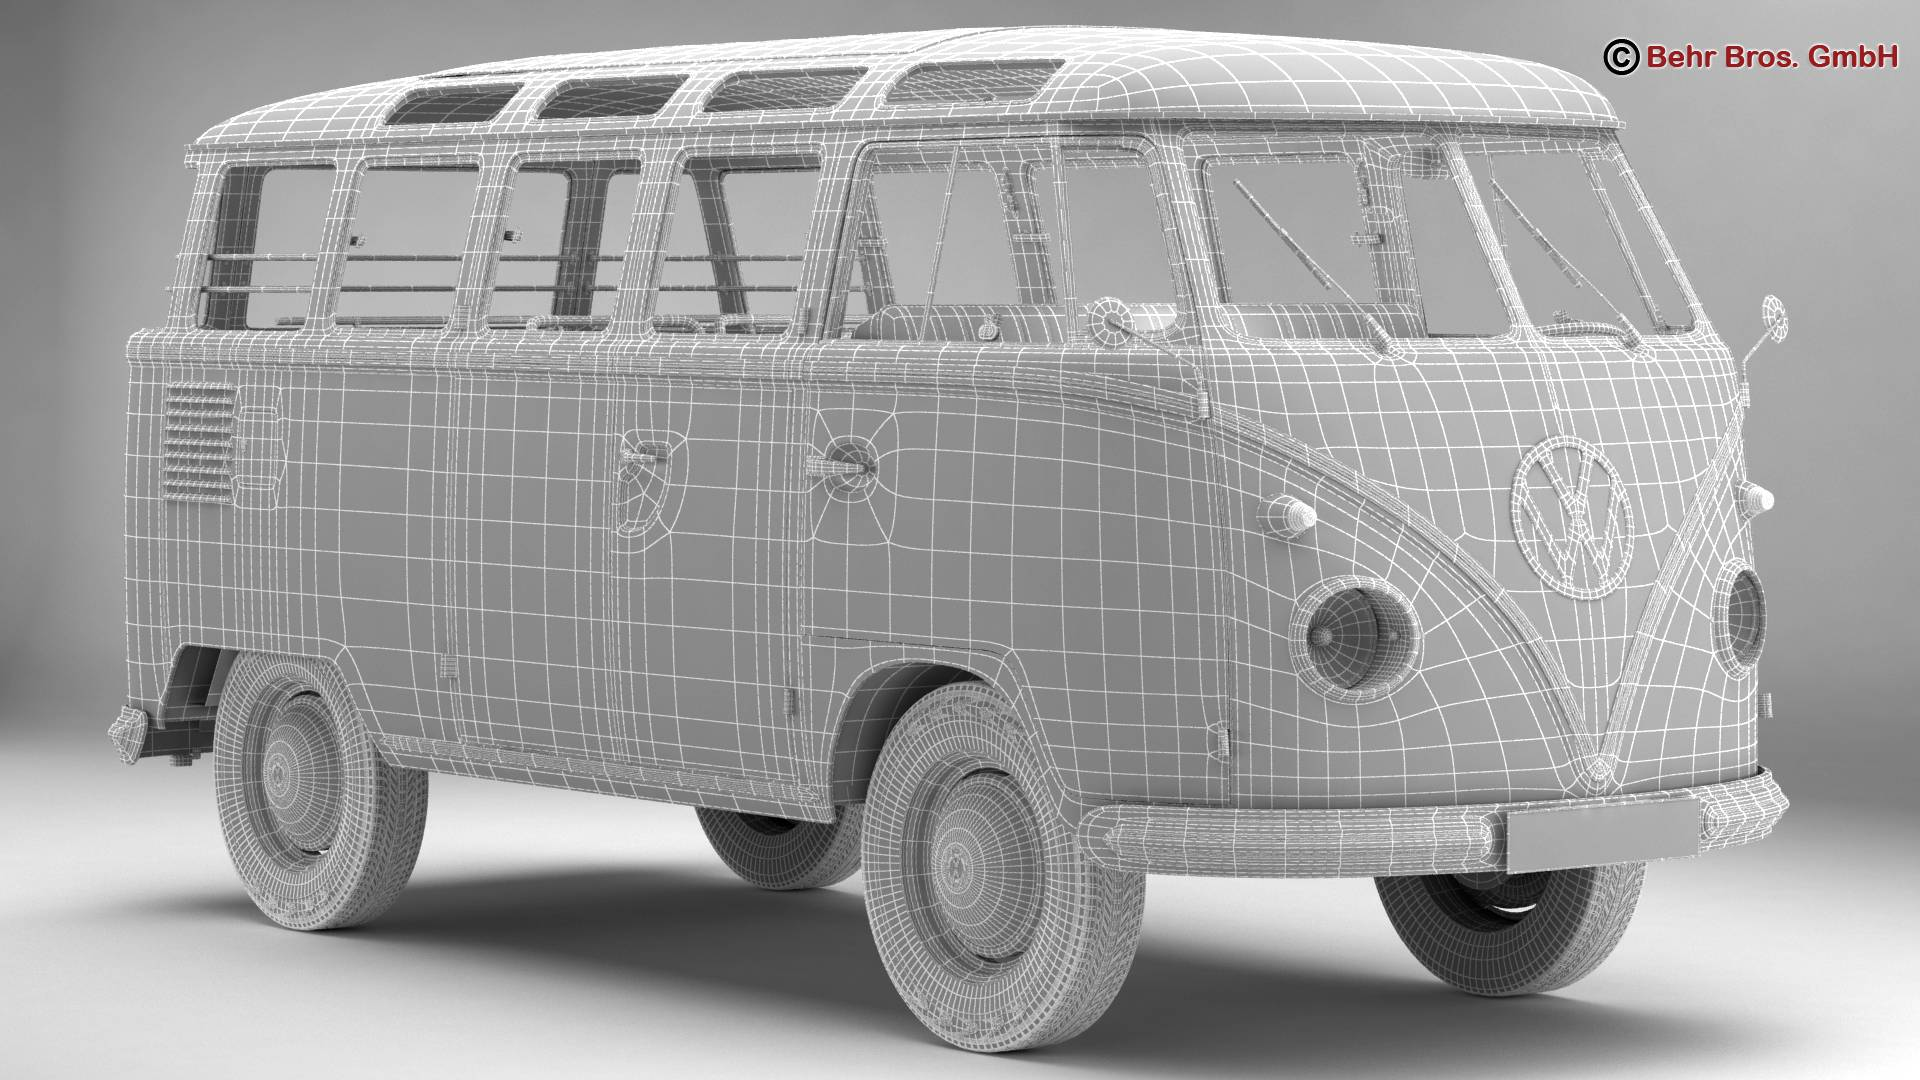 volkswagen type 2 samba 1959 3d model 3ds max fbx c4d lwo ma mb obj 217122